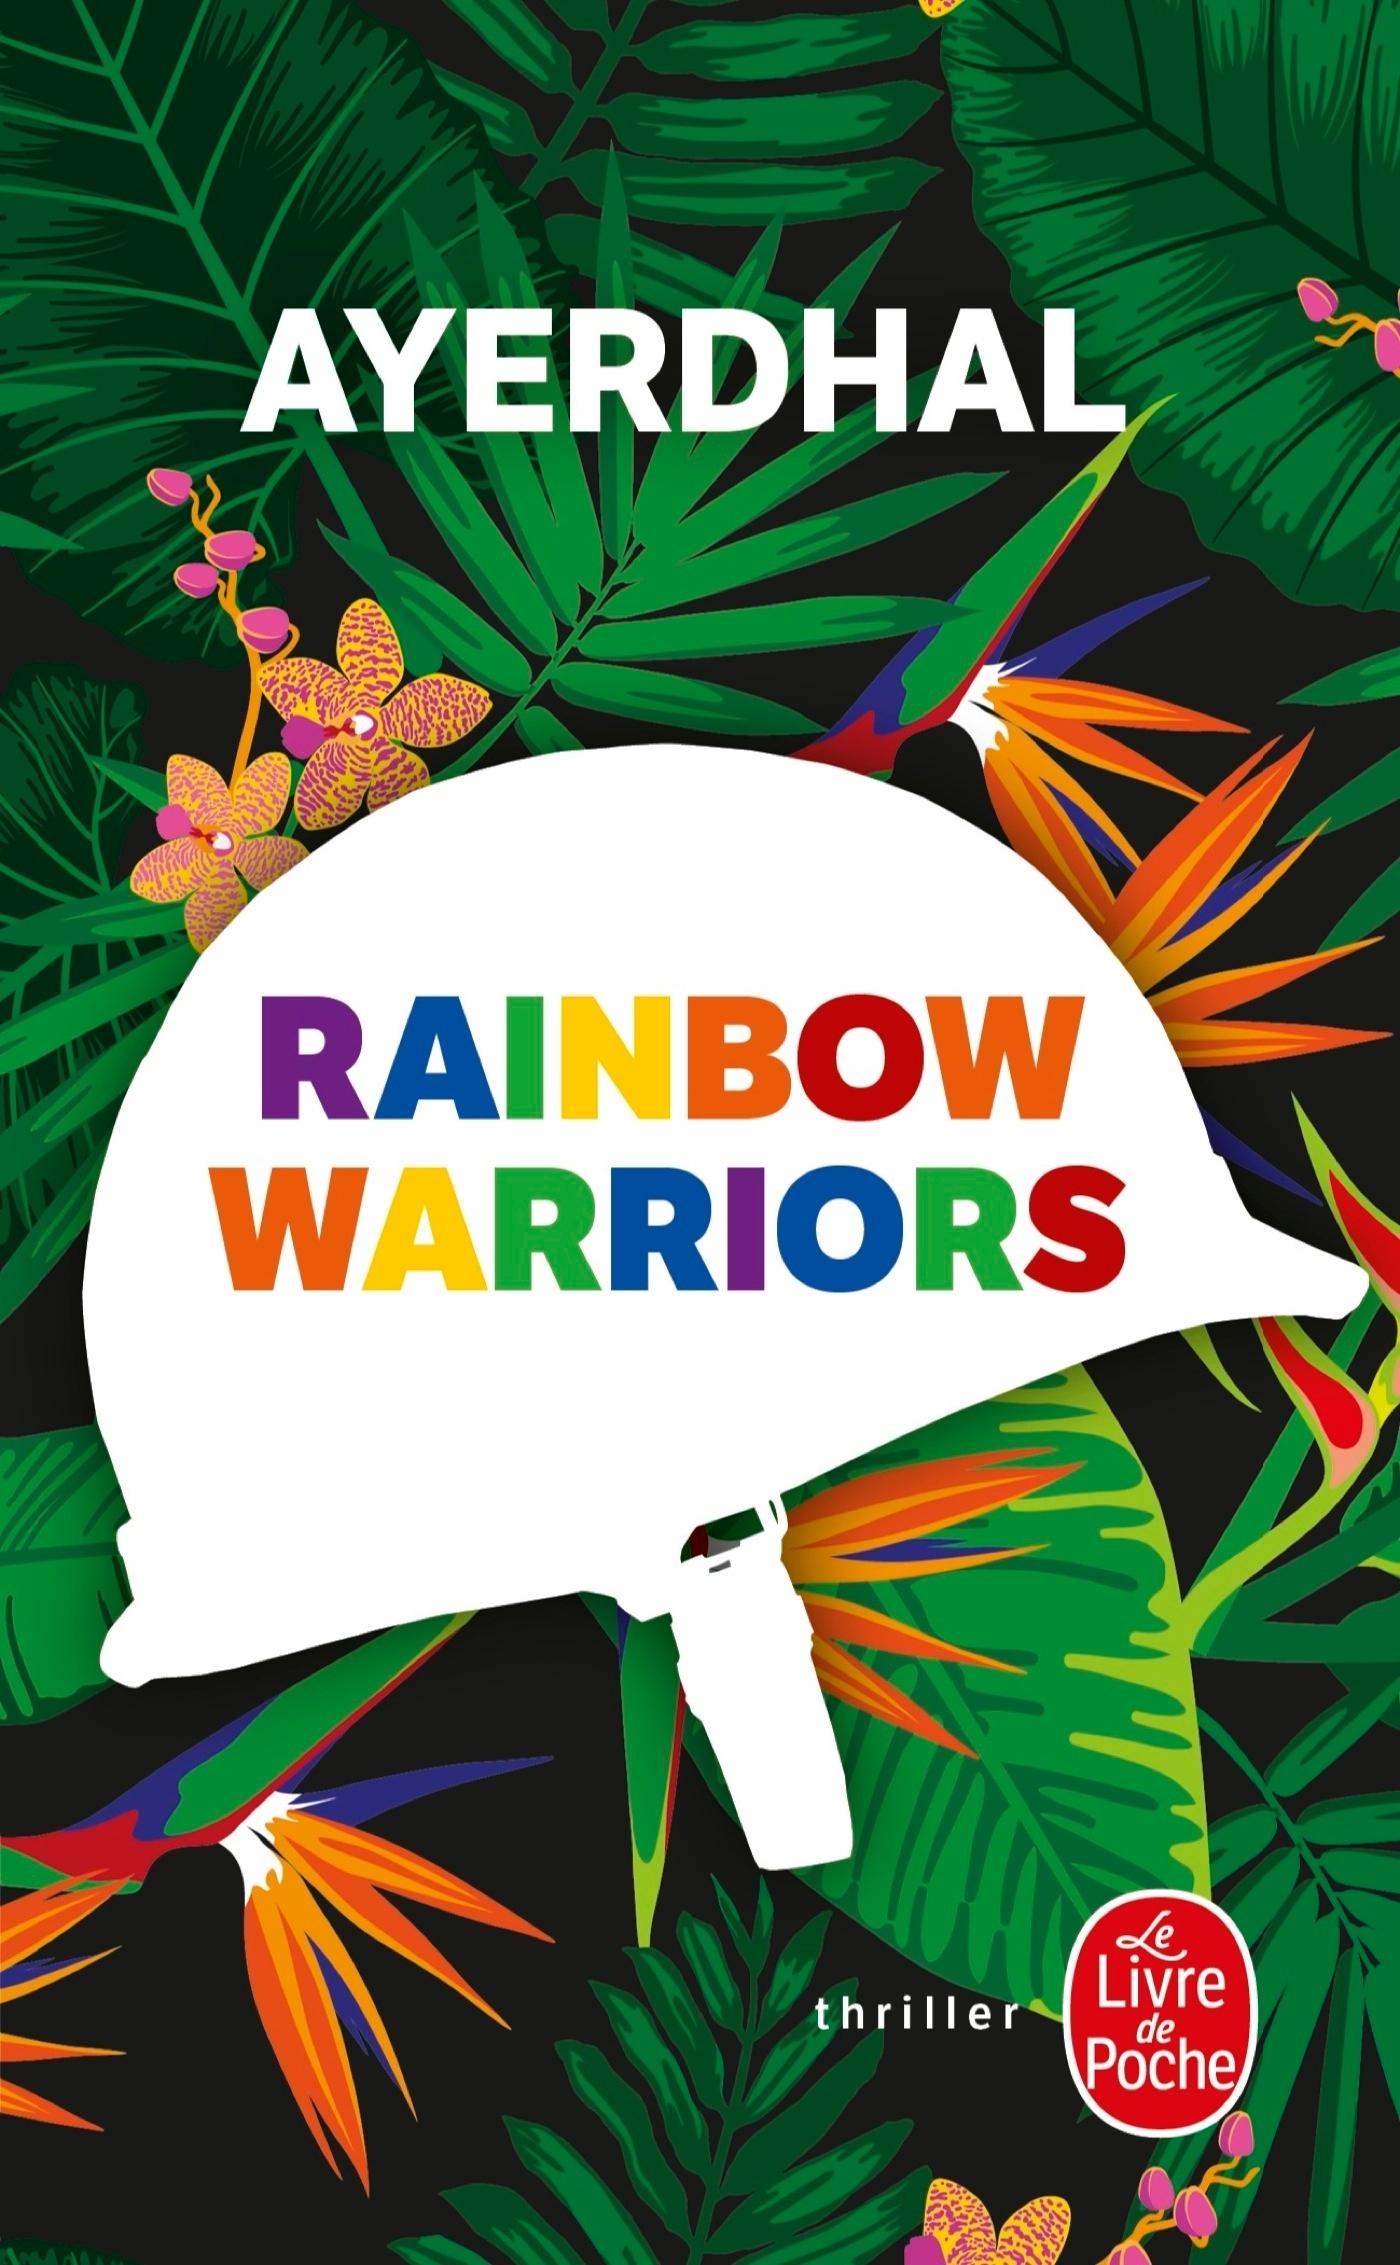 RAINBOWS WARRIORS